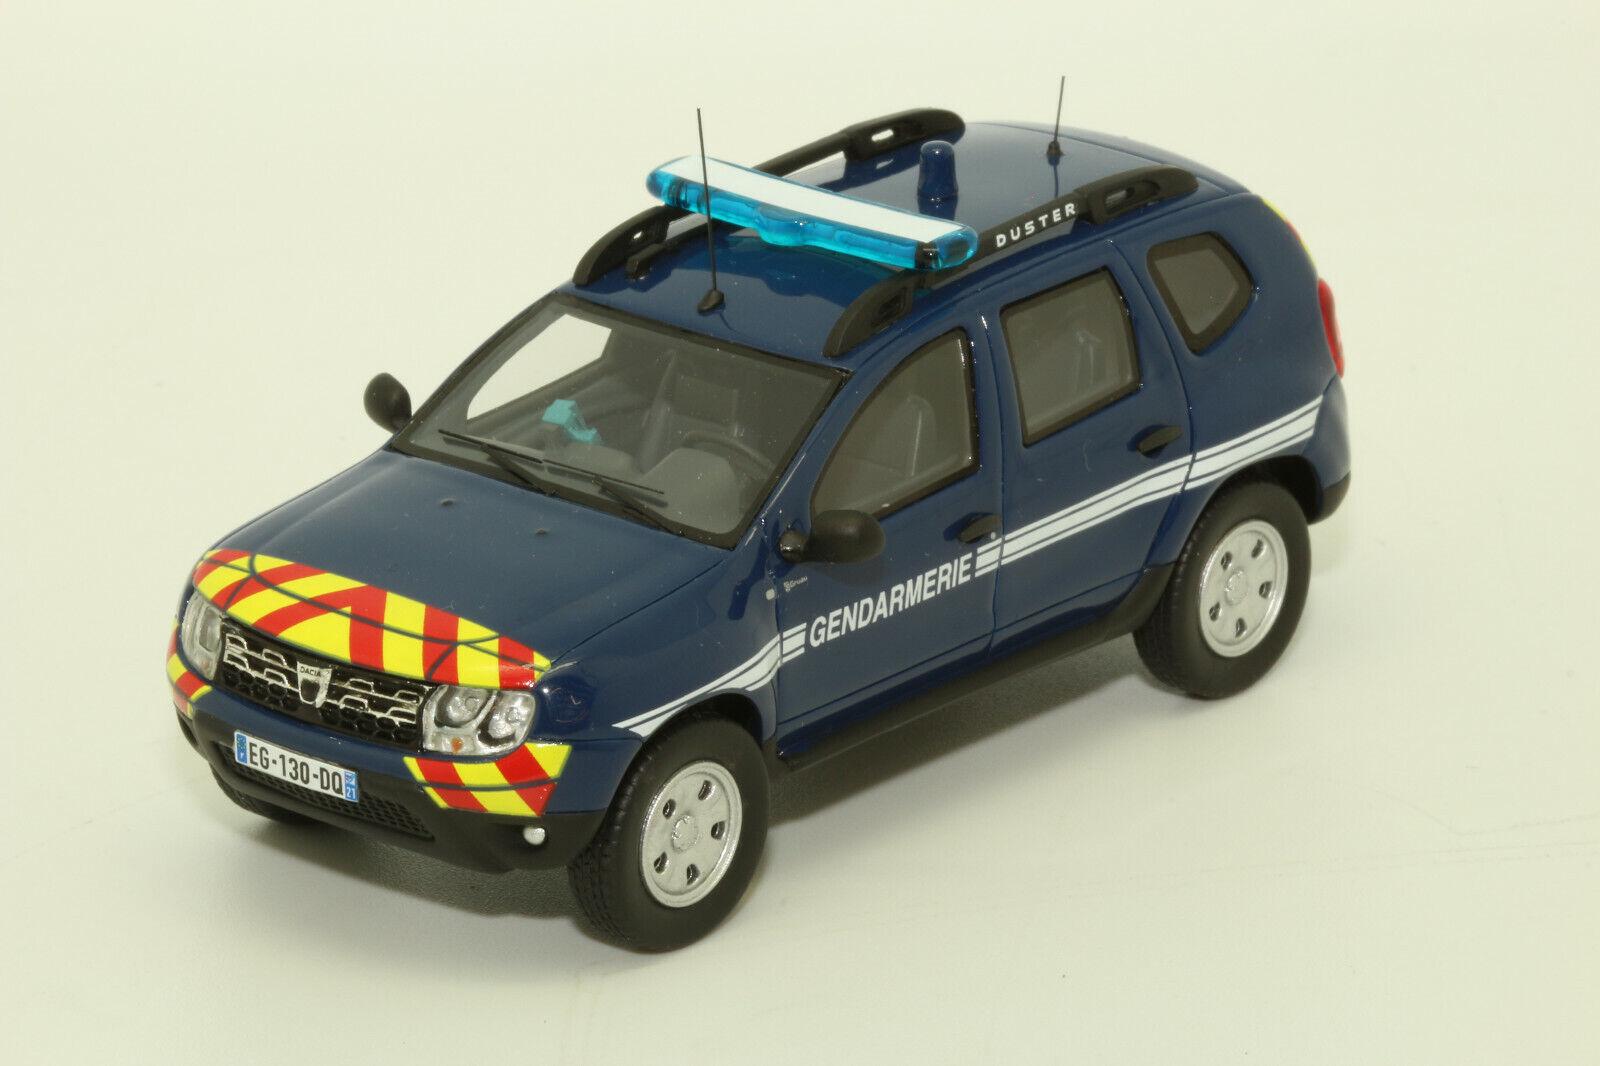 Dacia Duster Gendarmerie ALARME - ALA 0010 - Echelle 1 43 En Résine